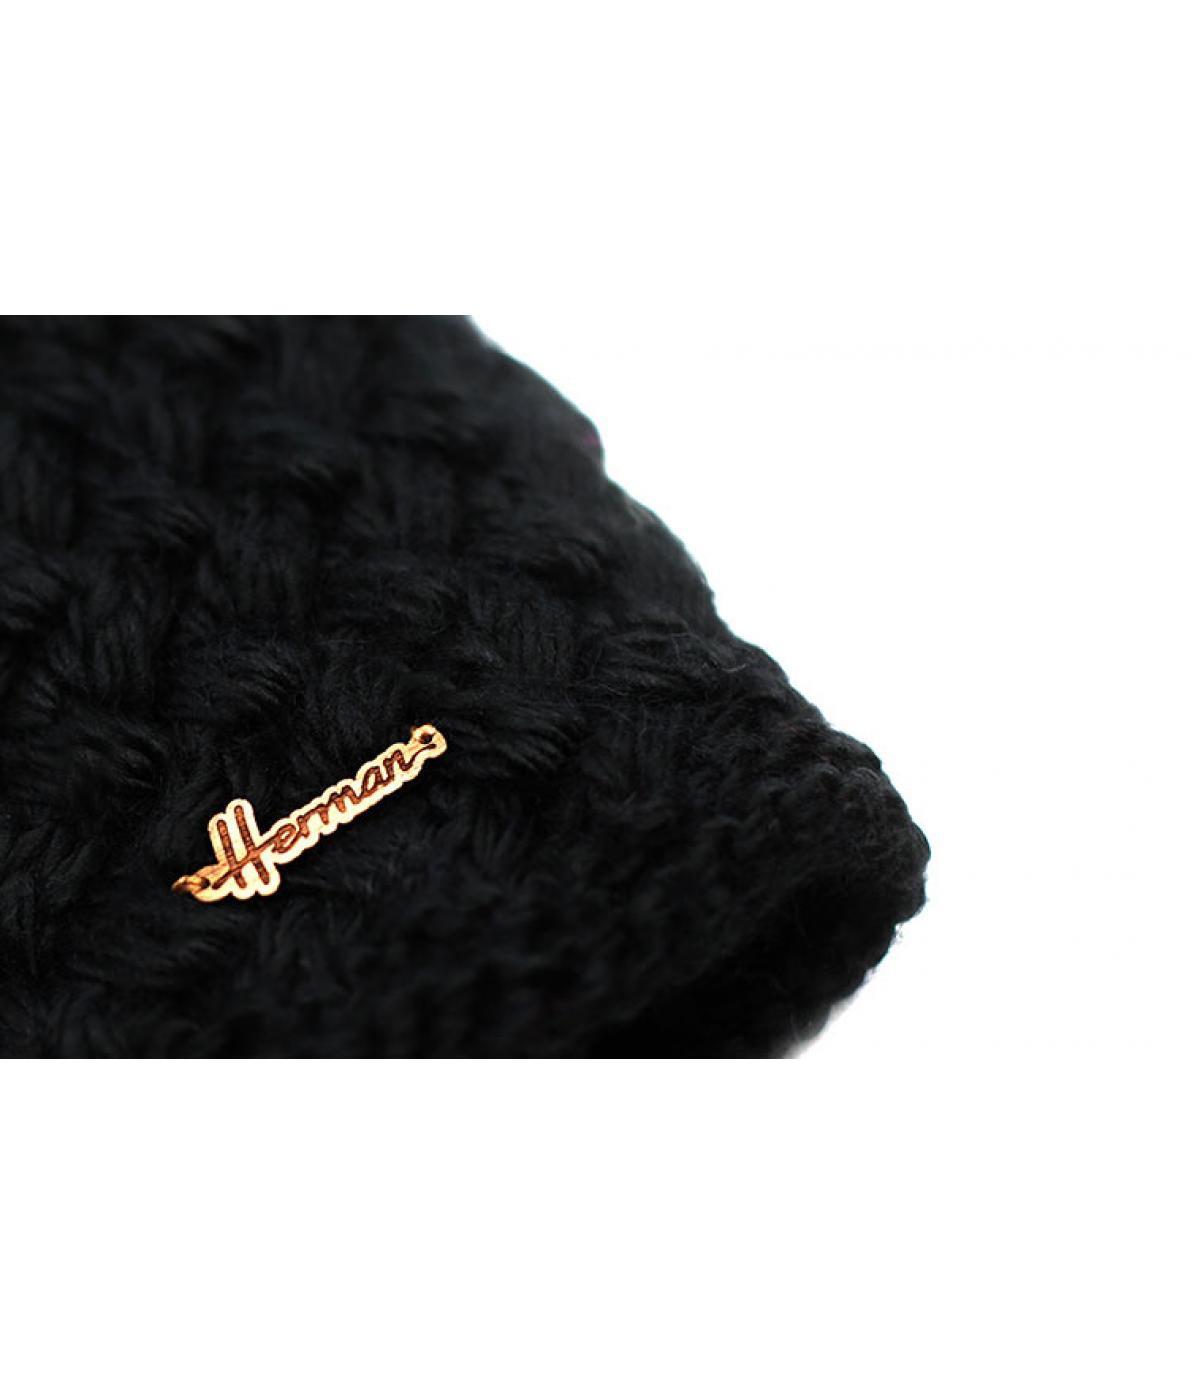 Dettagli Iloha Gloves black - image 2